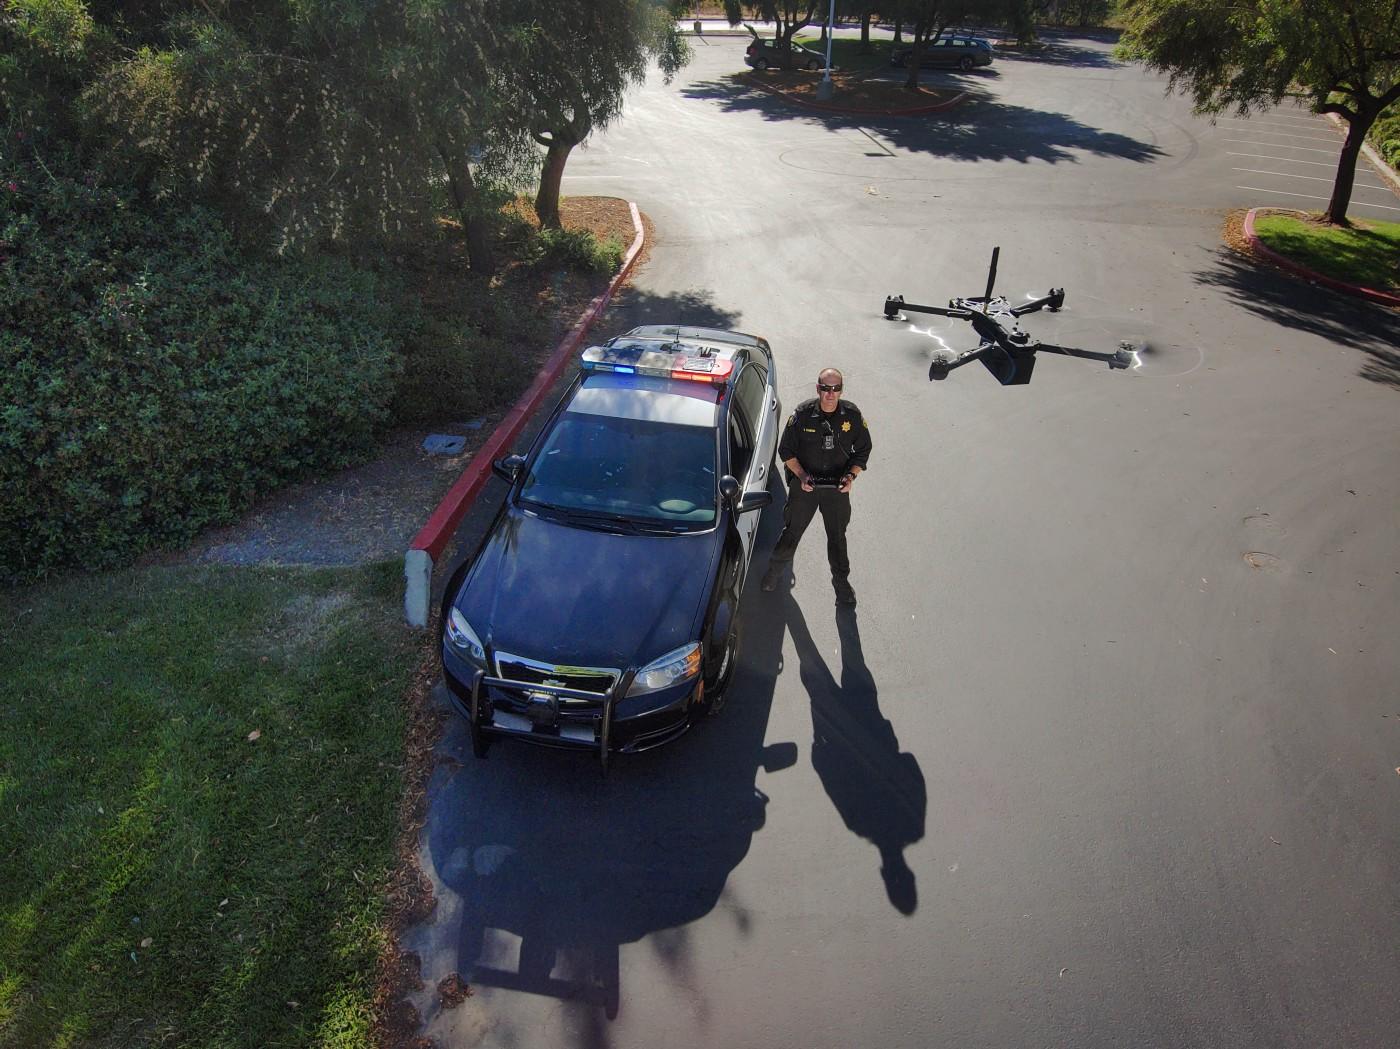 Skydio police drone